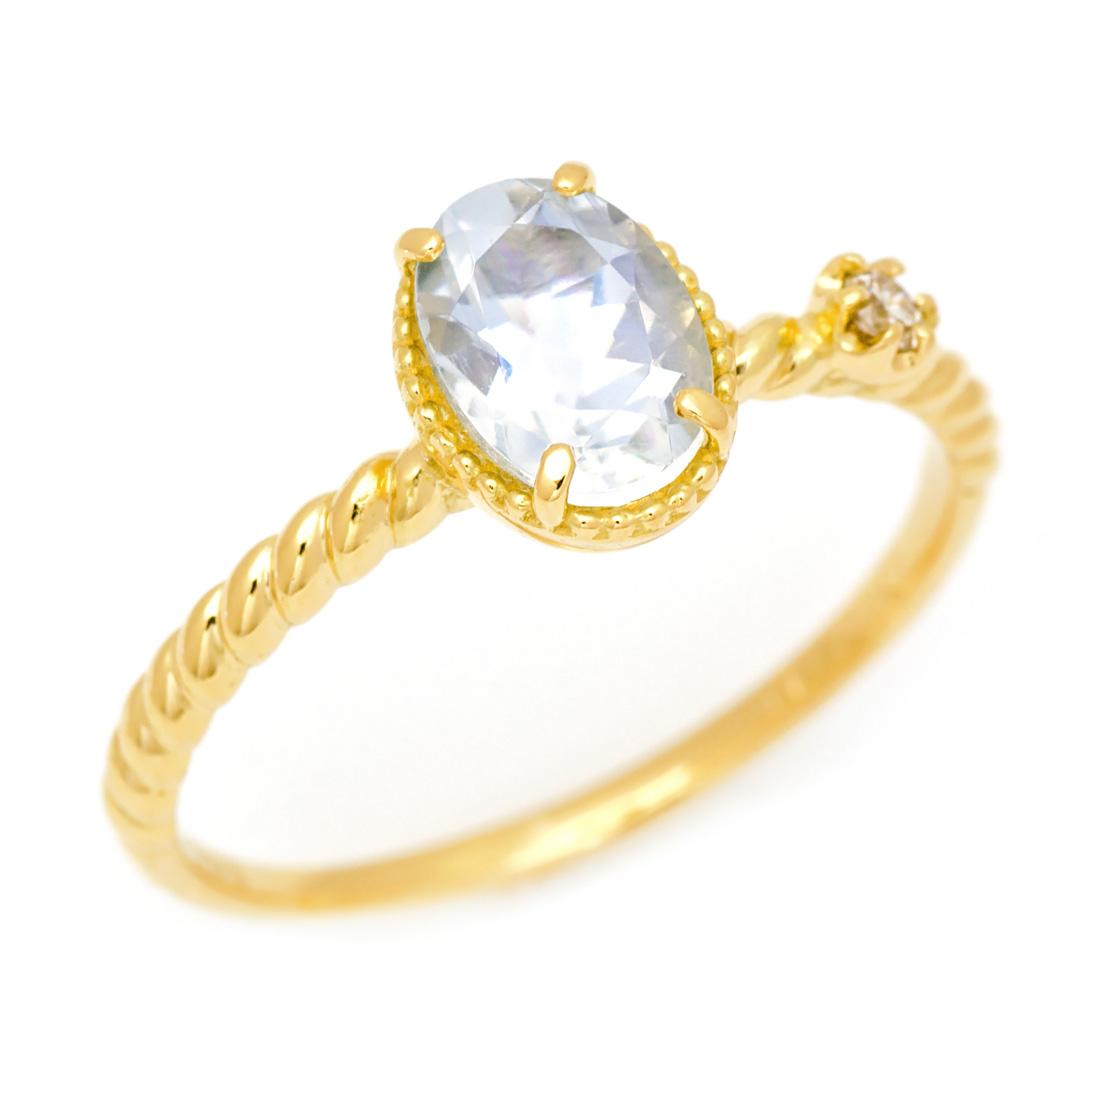 K18 ブルームーンストーン ダイヤモンド リング 「spaiato」送料無料 指輪 18K 18金 ゴールド カジュアル カラーストーン 6月誕生石 誕生日 文字入れ 刻印 ピンキーリング対応可能 メッセージ ギフト 贈り物